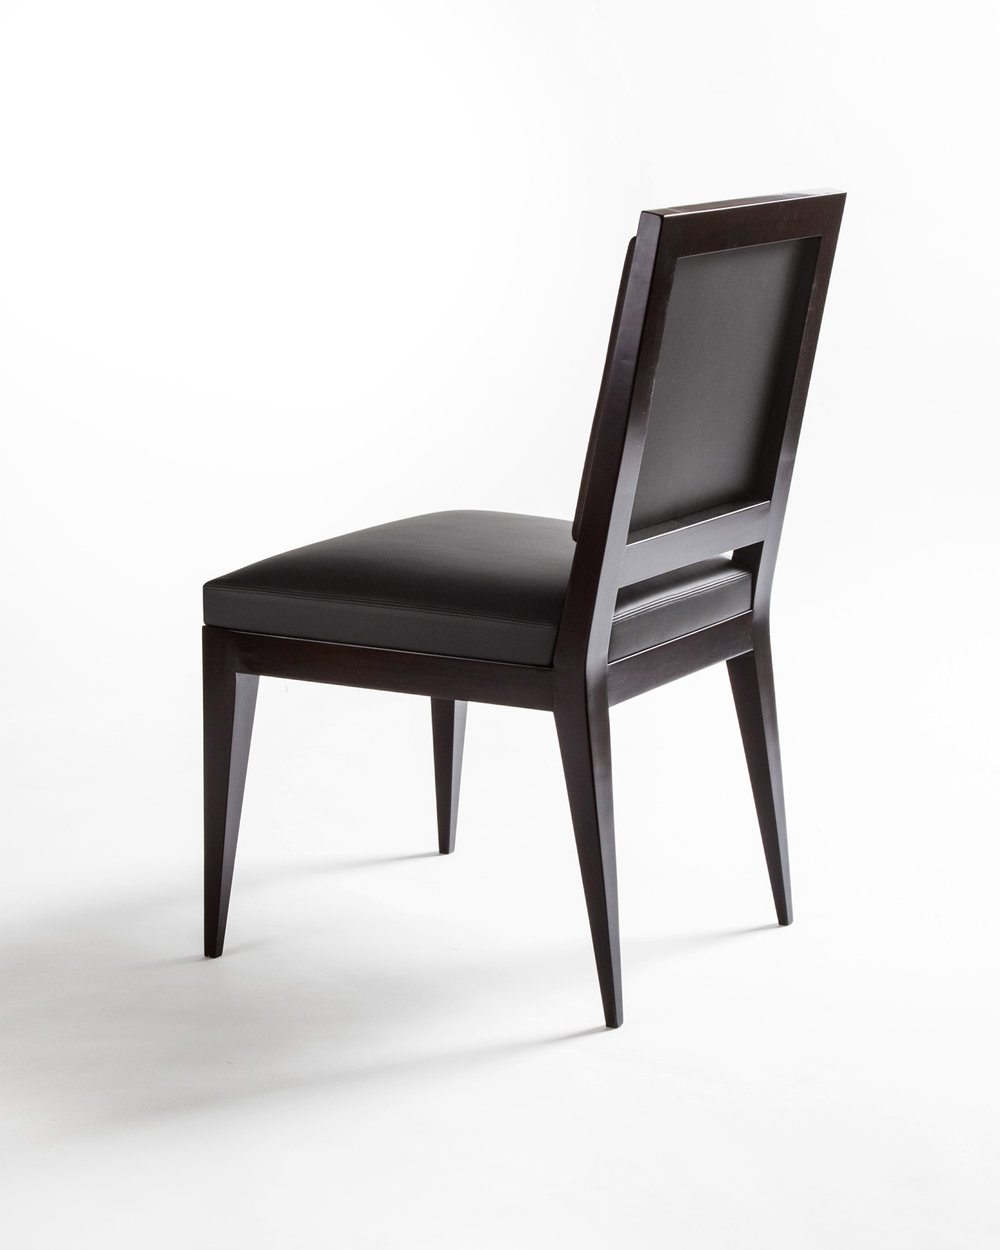 Carre_Side_Chair_017.jpg